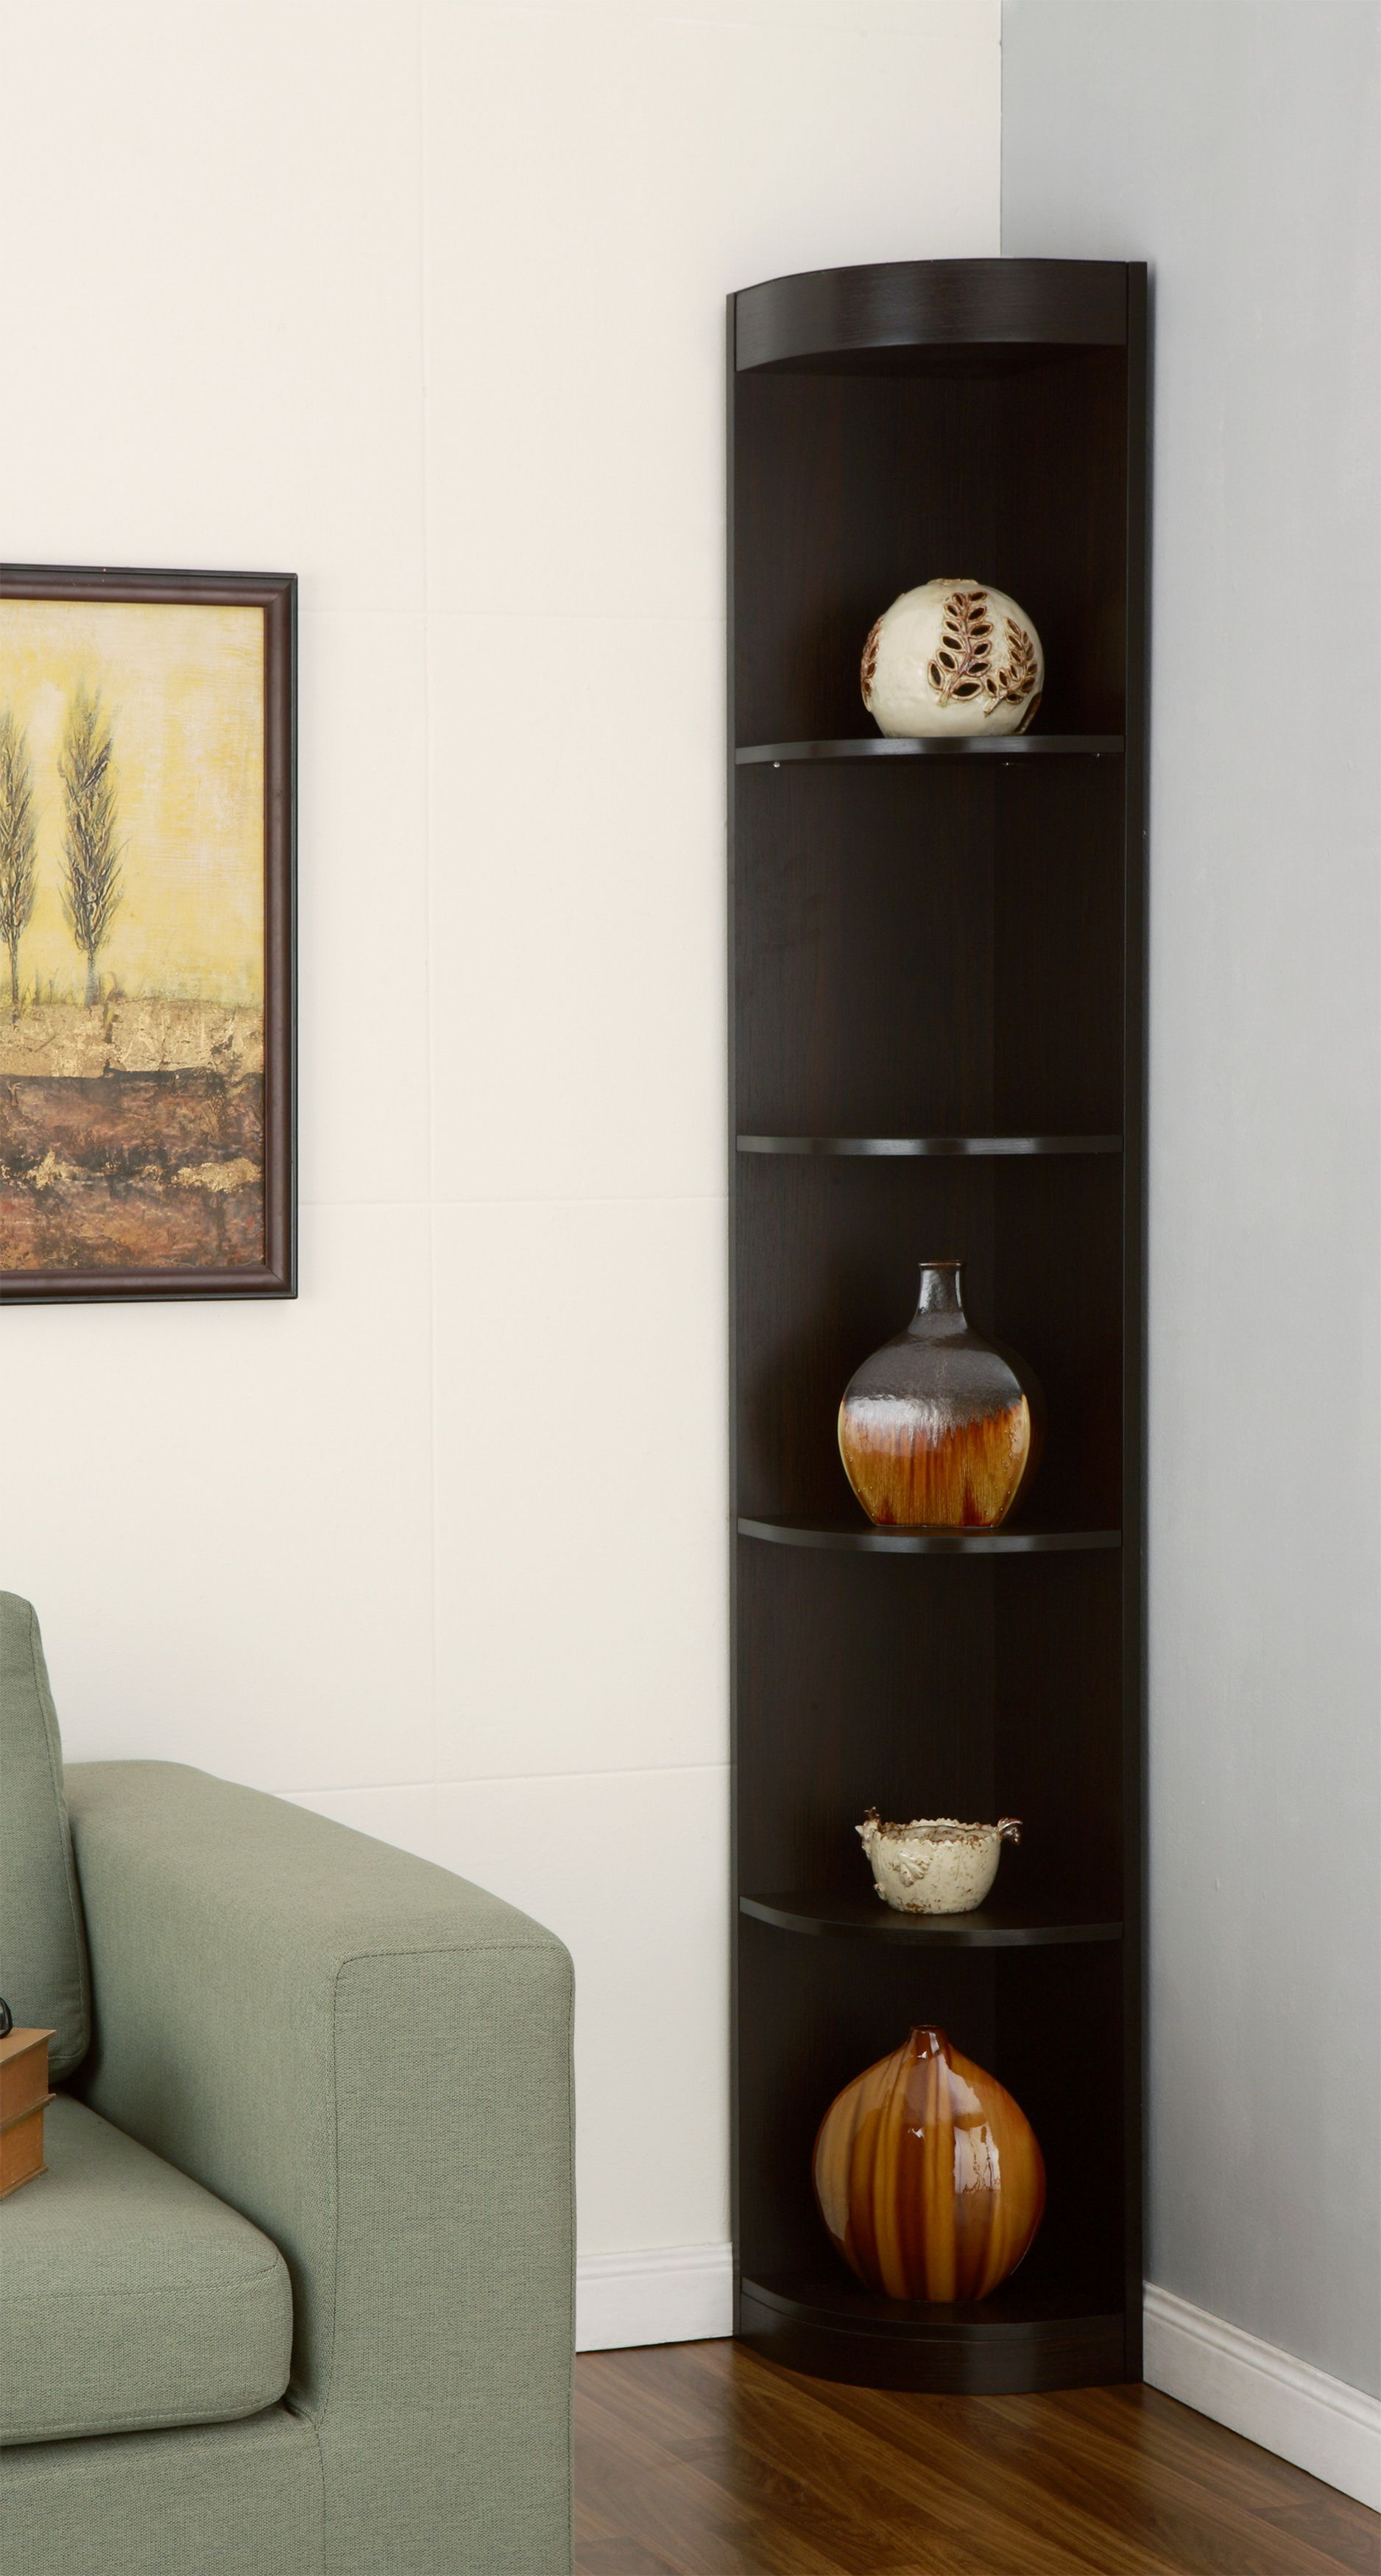 Furniture of America Ogla 5-Tier Corner Espresso Display Stand, Brown